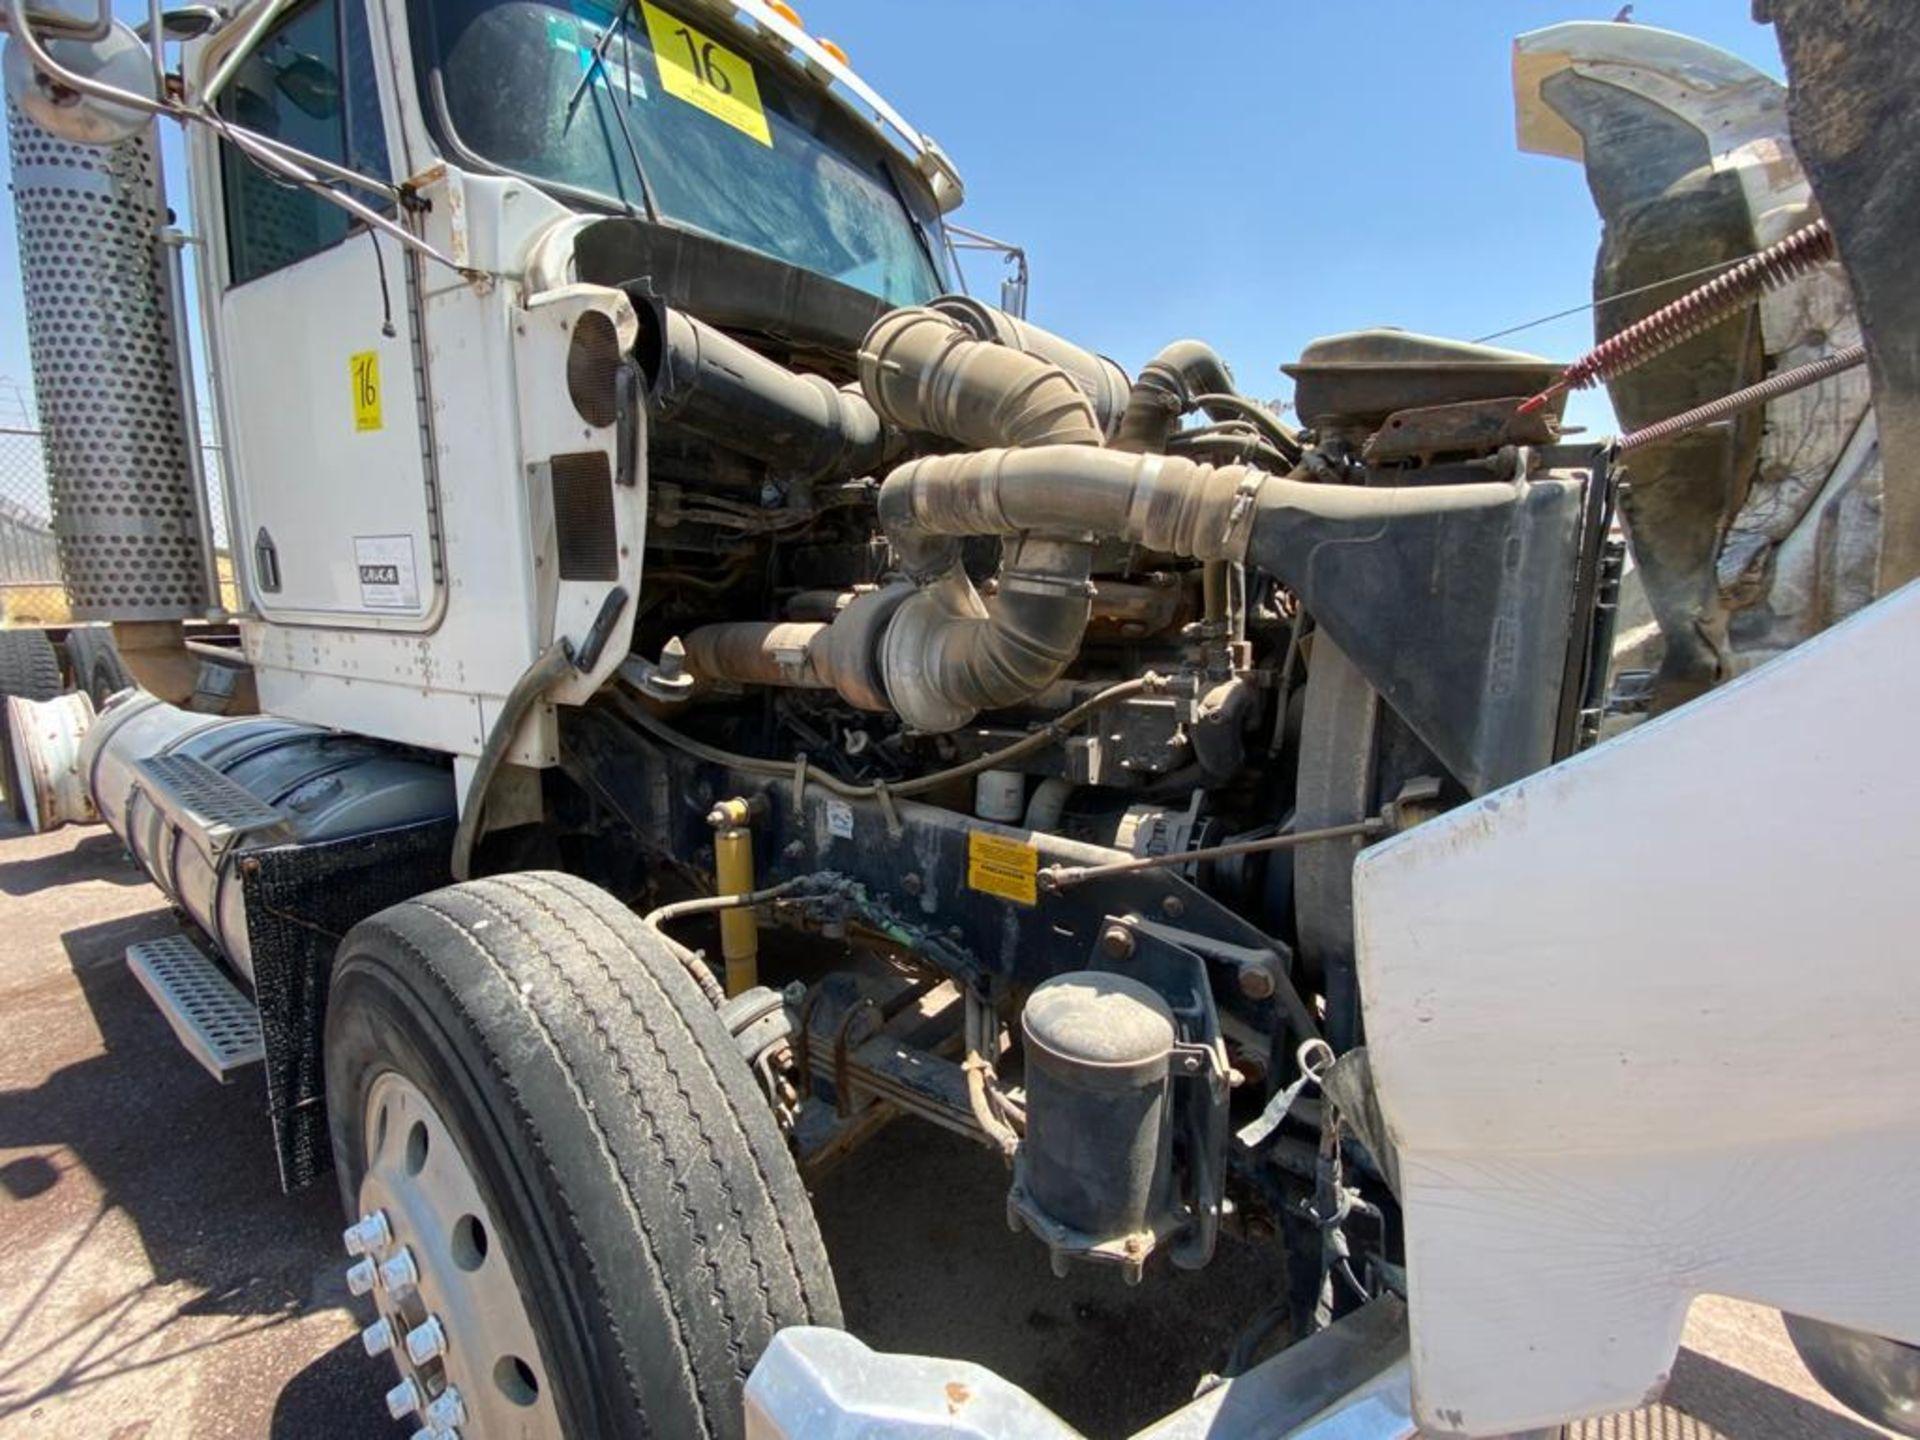 1998 Kenworth 5000 Gallon, standard transmission of 16 speeds - Image 47 of 68